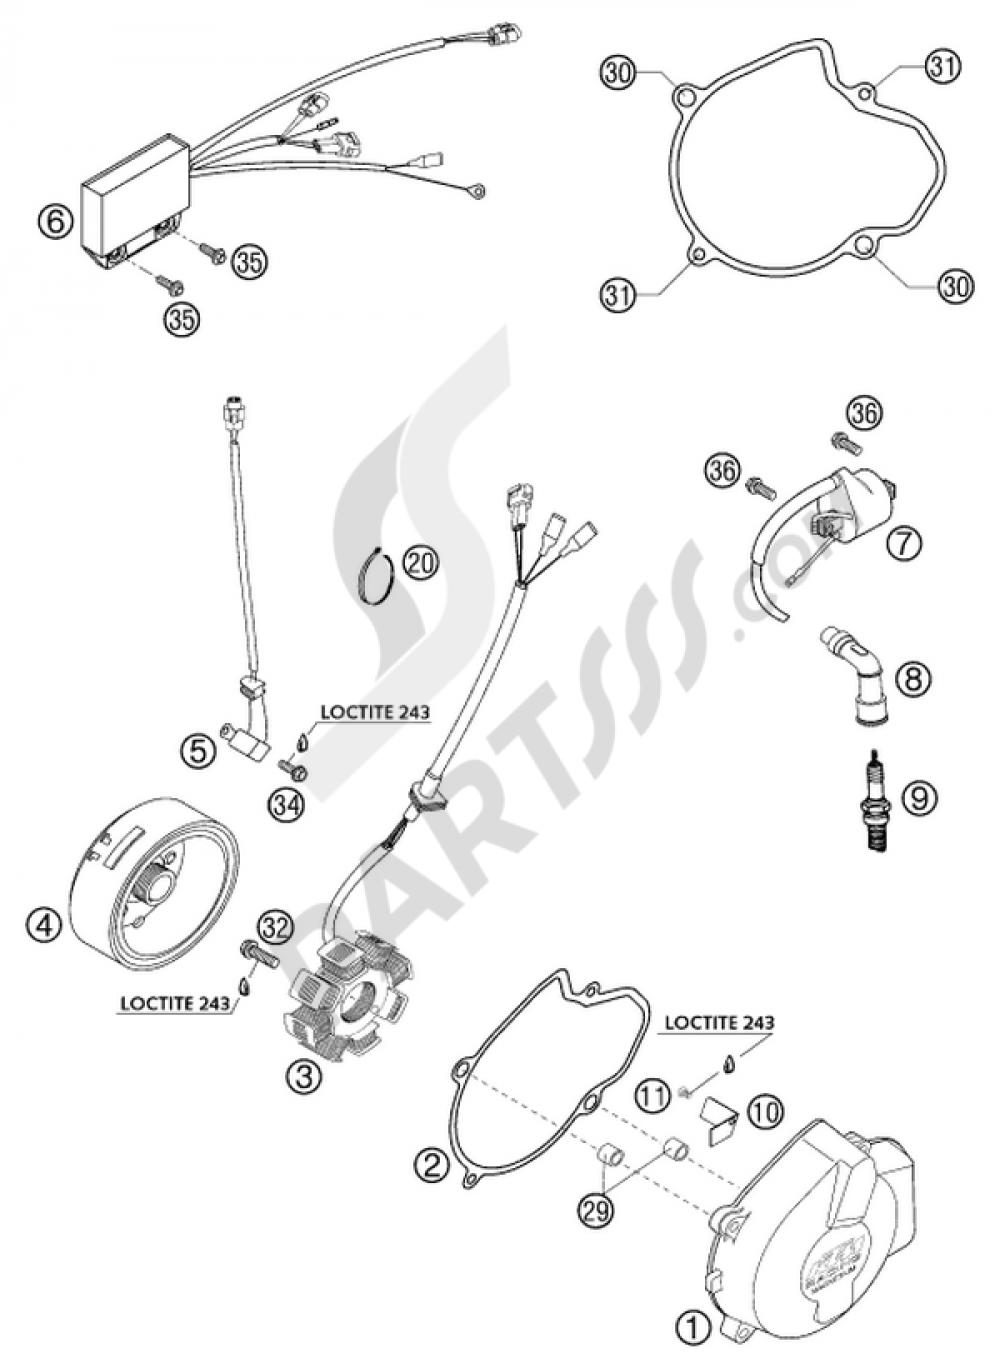 Bujía Tapa para 2001 KTM 520 Exc Racing